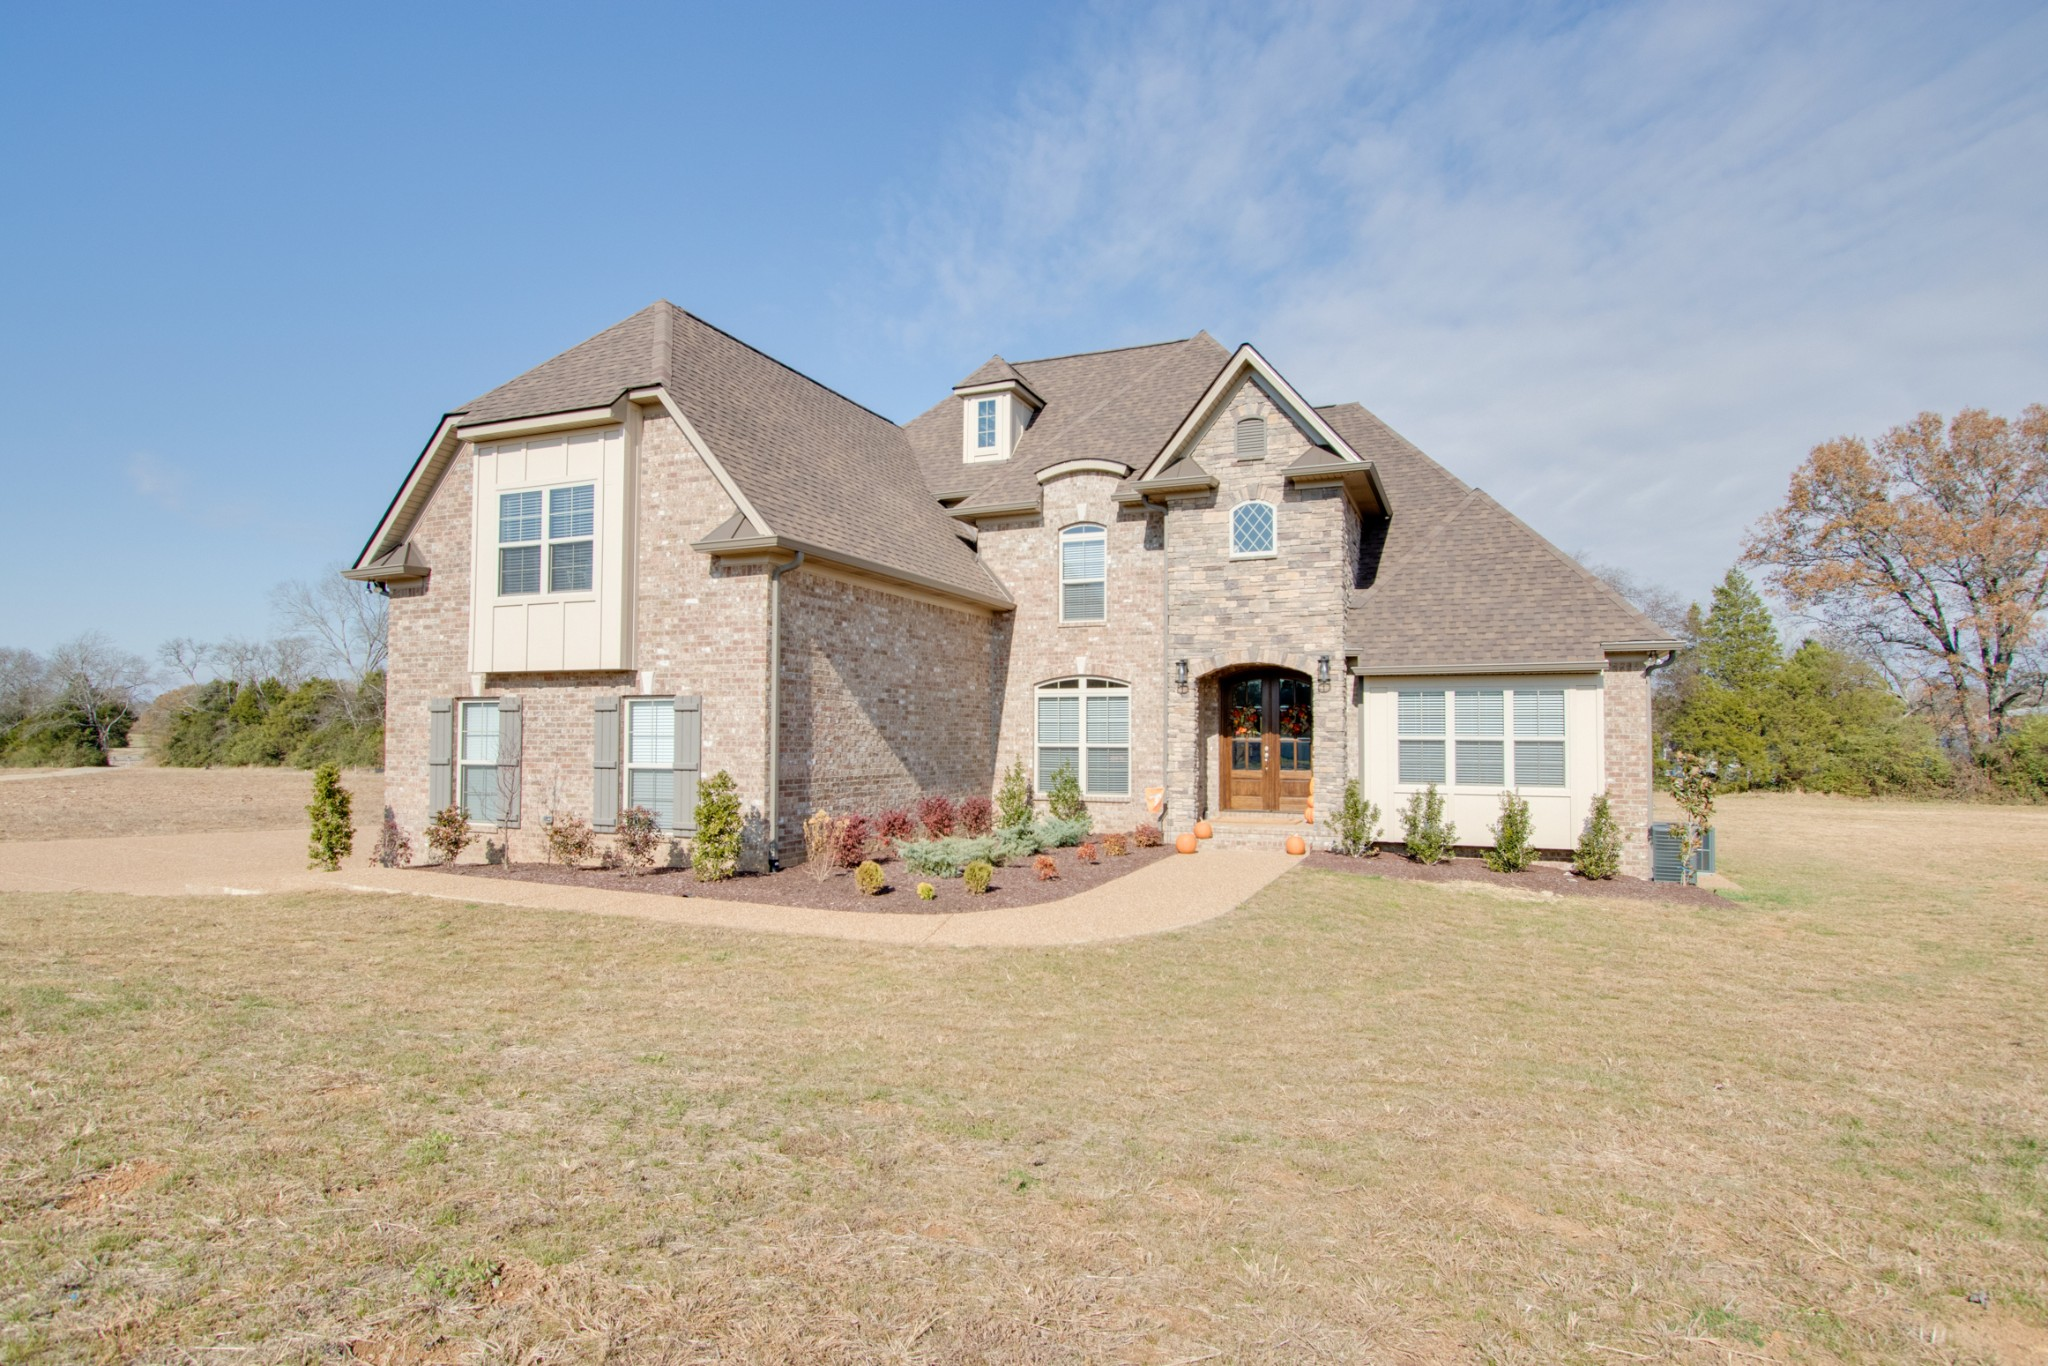 819 Brook Trl, Lebanon, TN 37087 - Lebanon, TN real estate listing